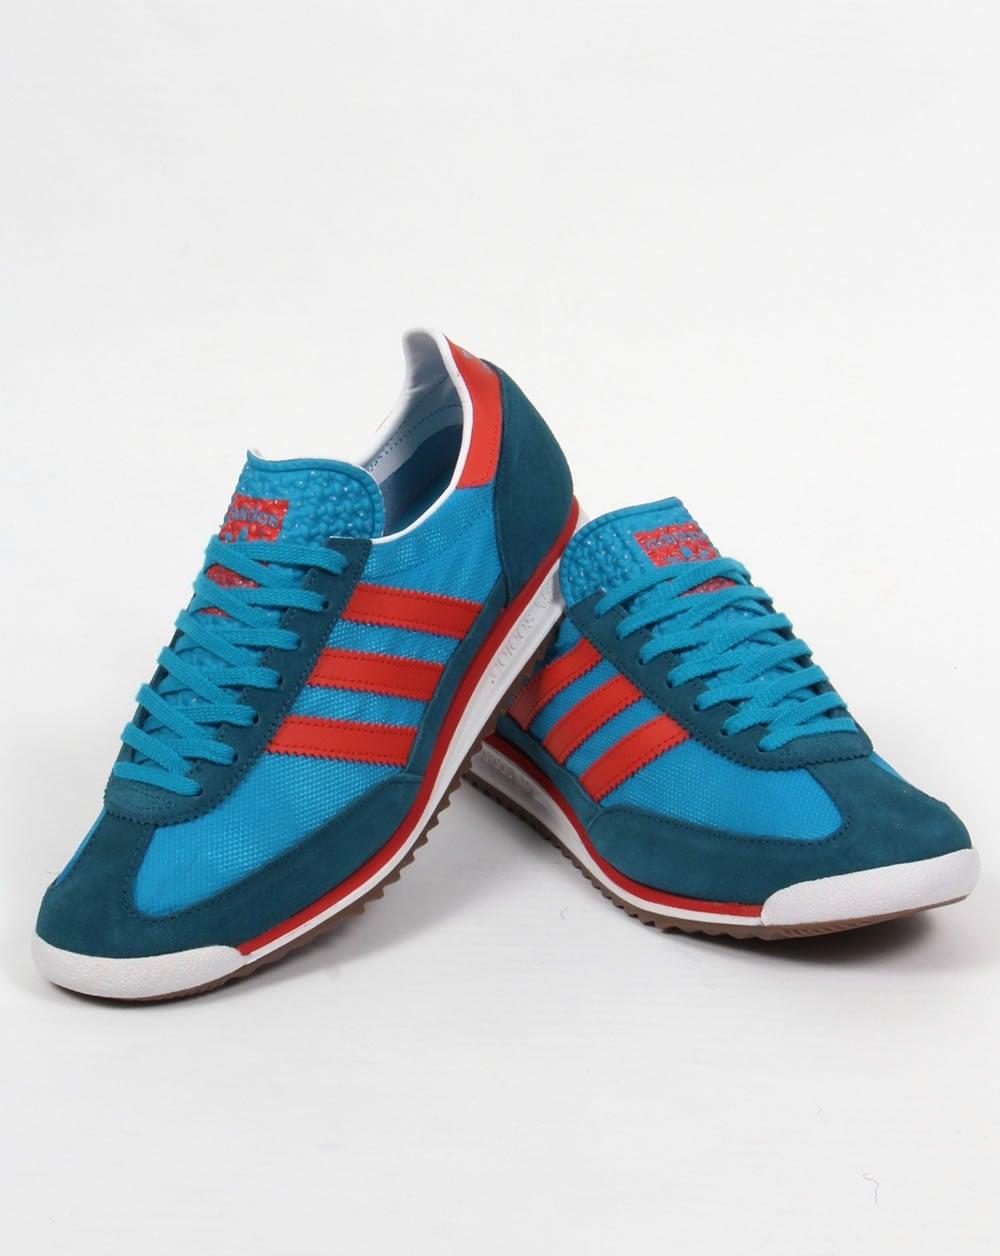 sale retailer d6133 4b3af Adidas SL 72 Trainers Bold Aqua surf Red